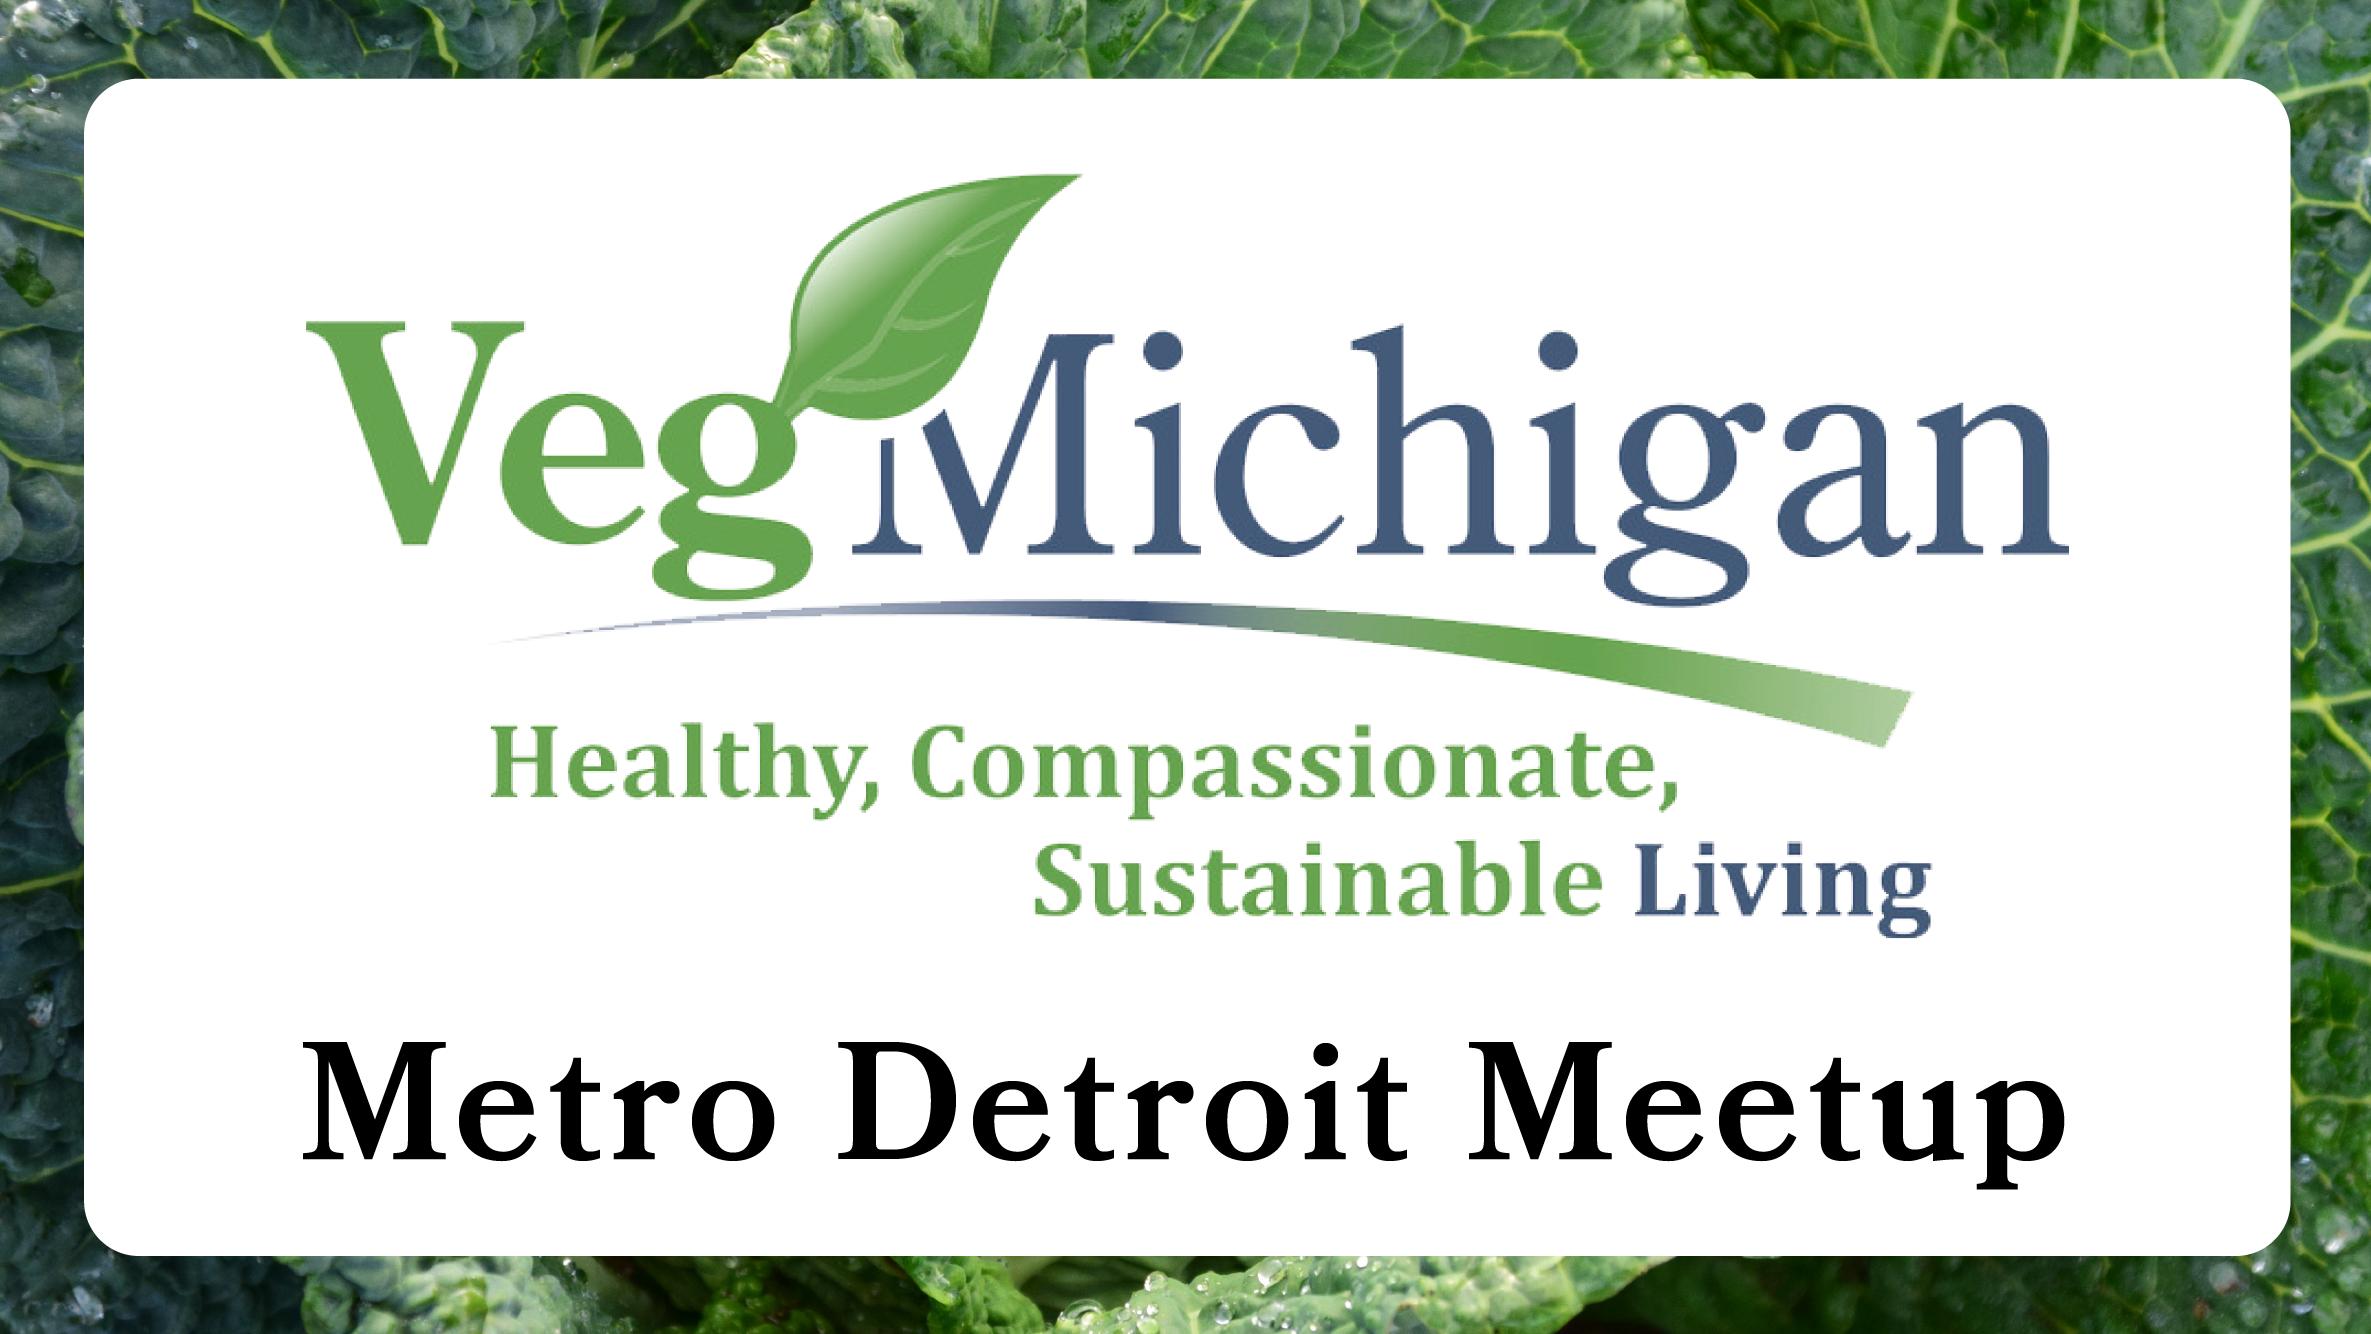 VegMichigan Metro Detroit Meetup